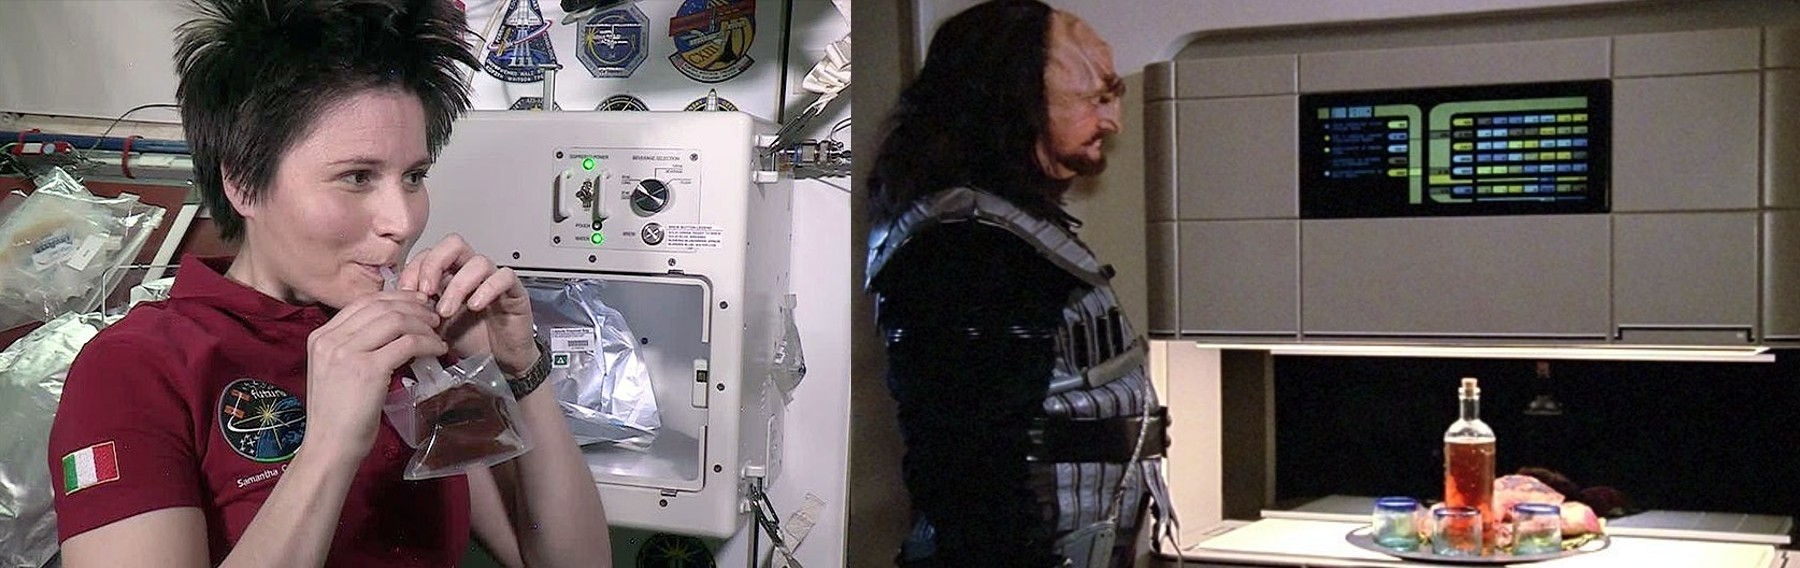 ISS vs ST Food replicator